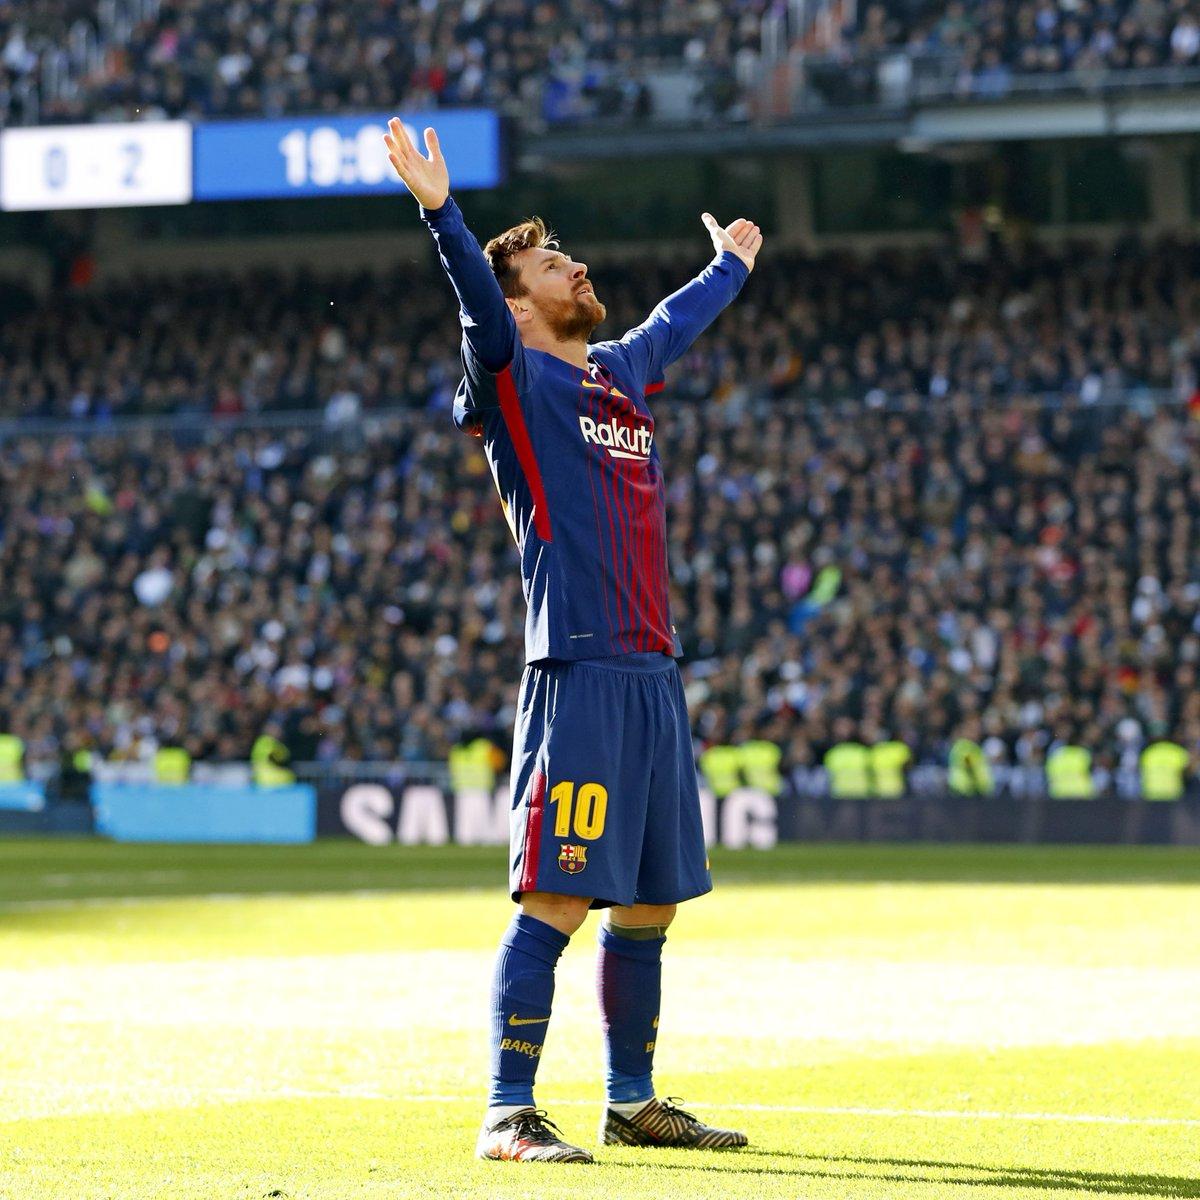 🔙 One year ago... 📸 The moment  💫 Leo #Messi 📍 Bernabéu Stadium